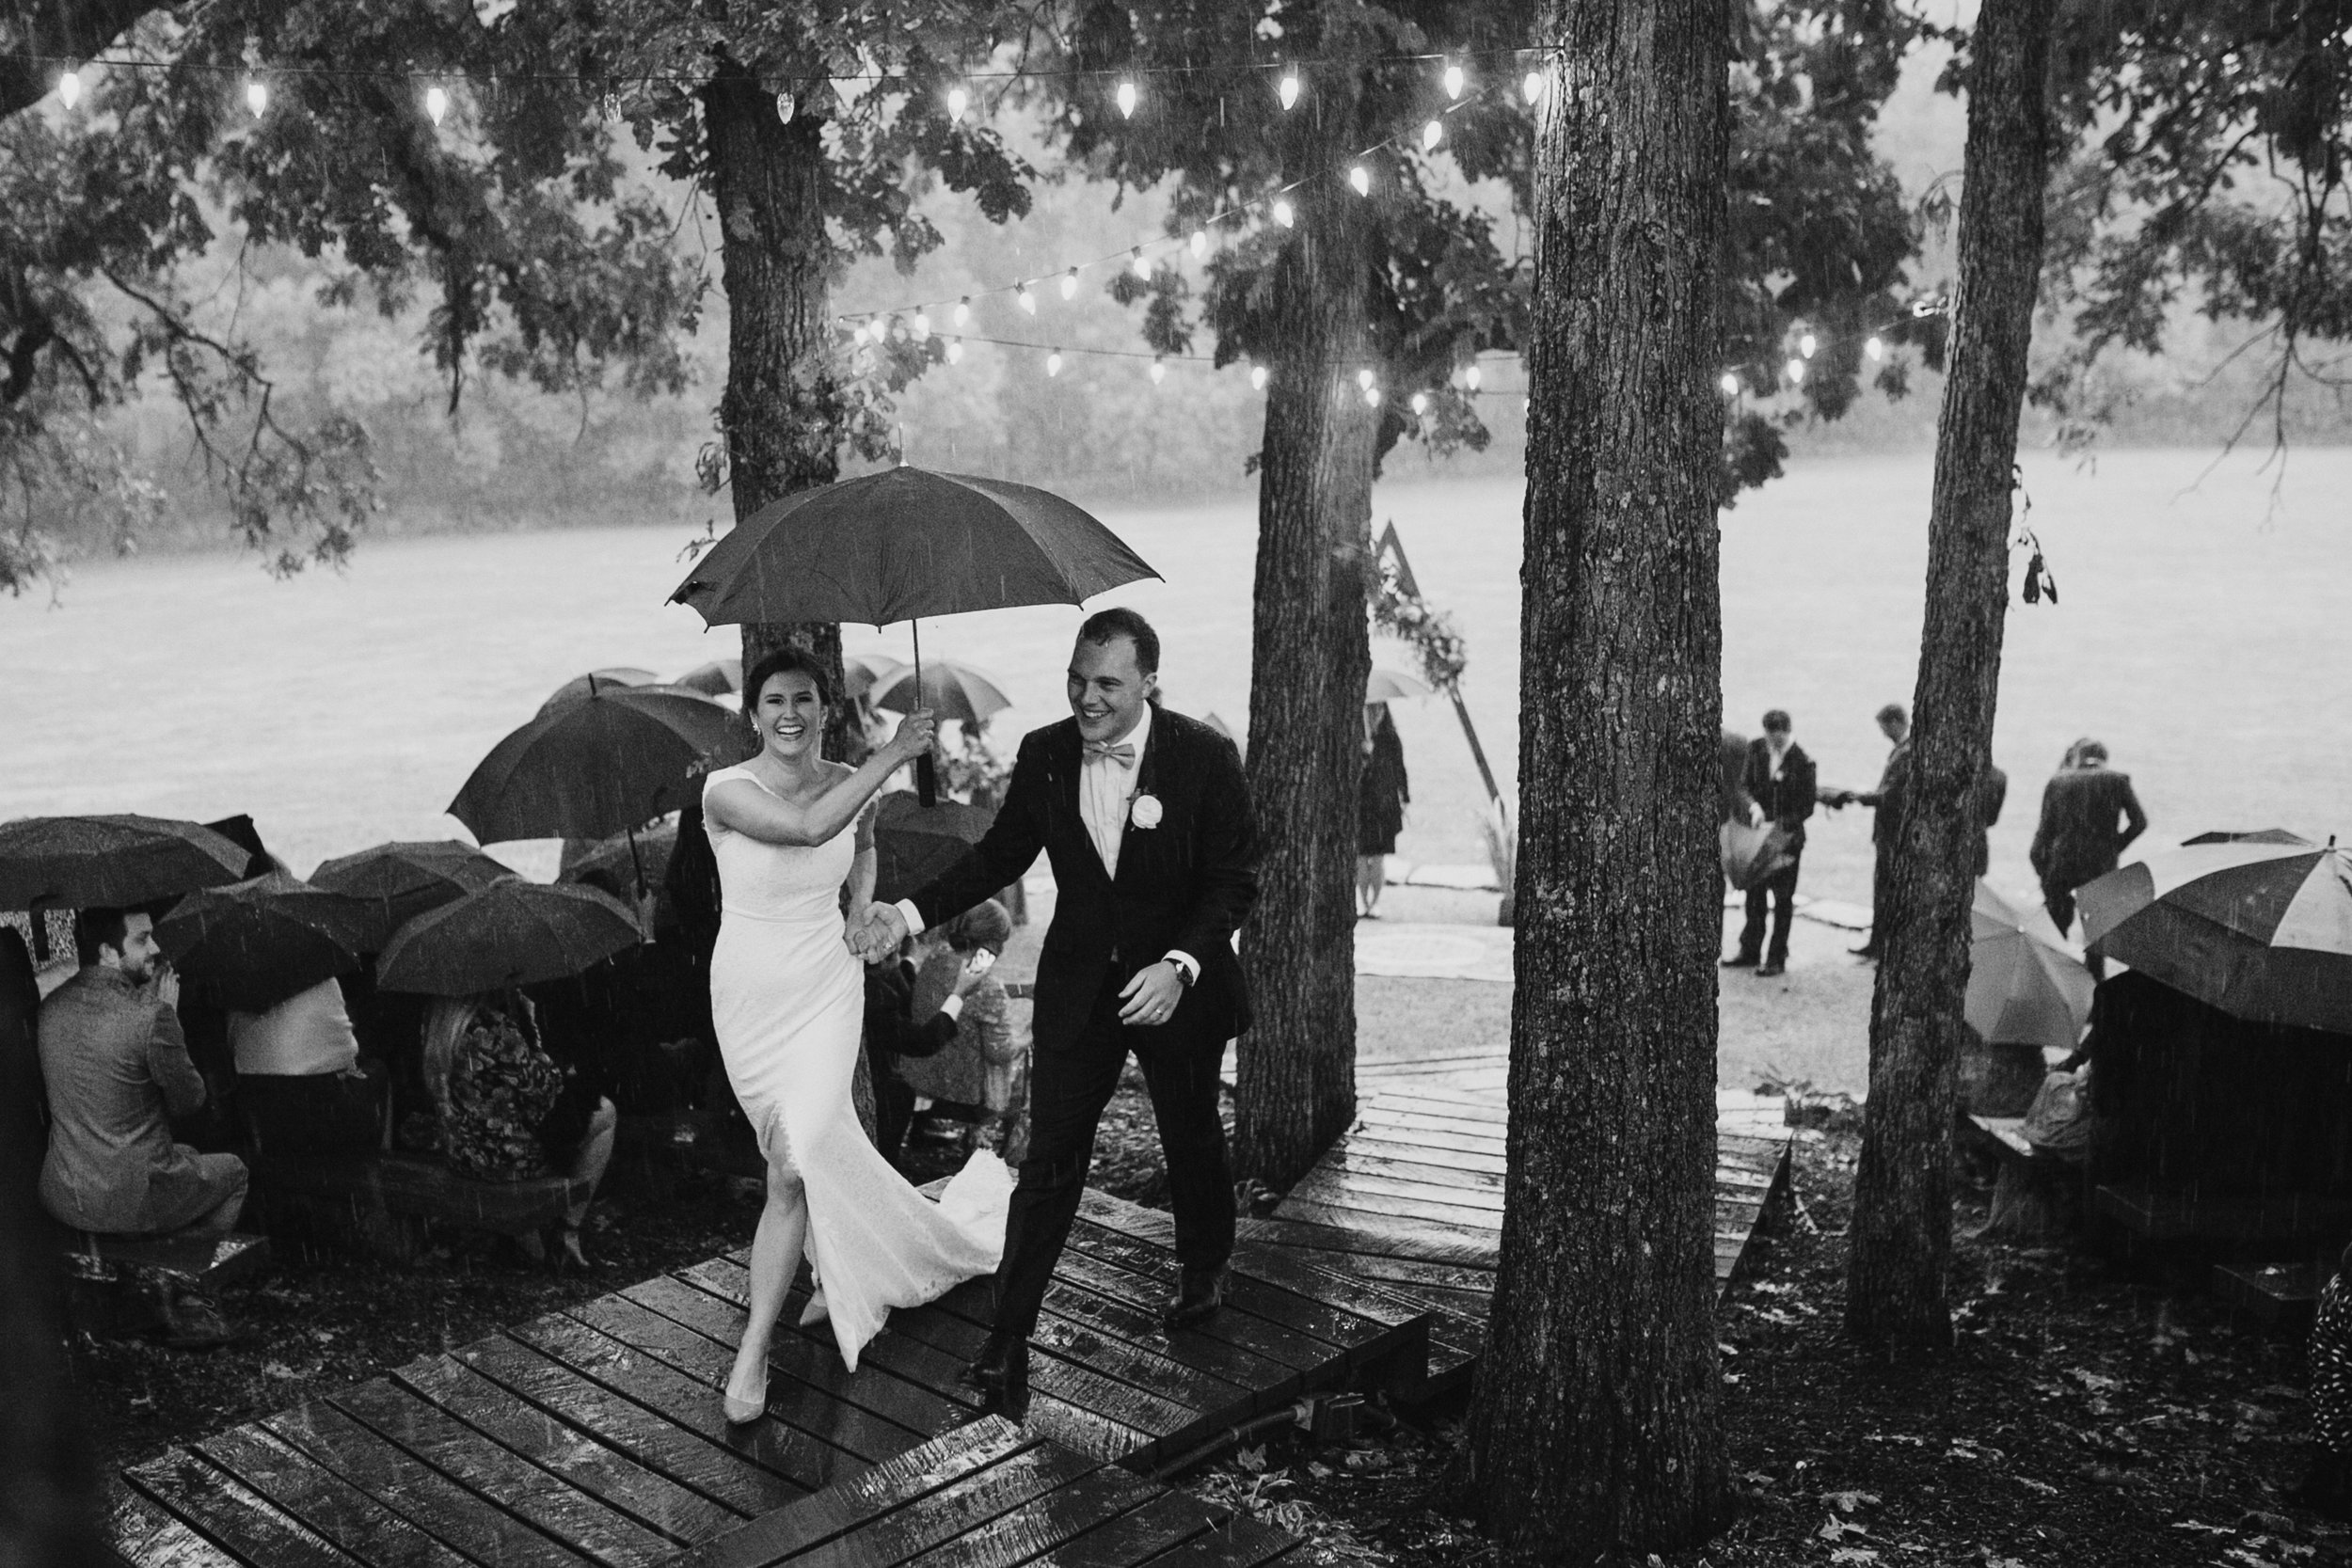 woltemath-wedding-434a.jpg